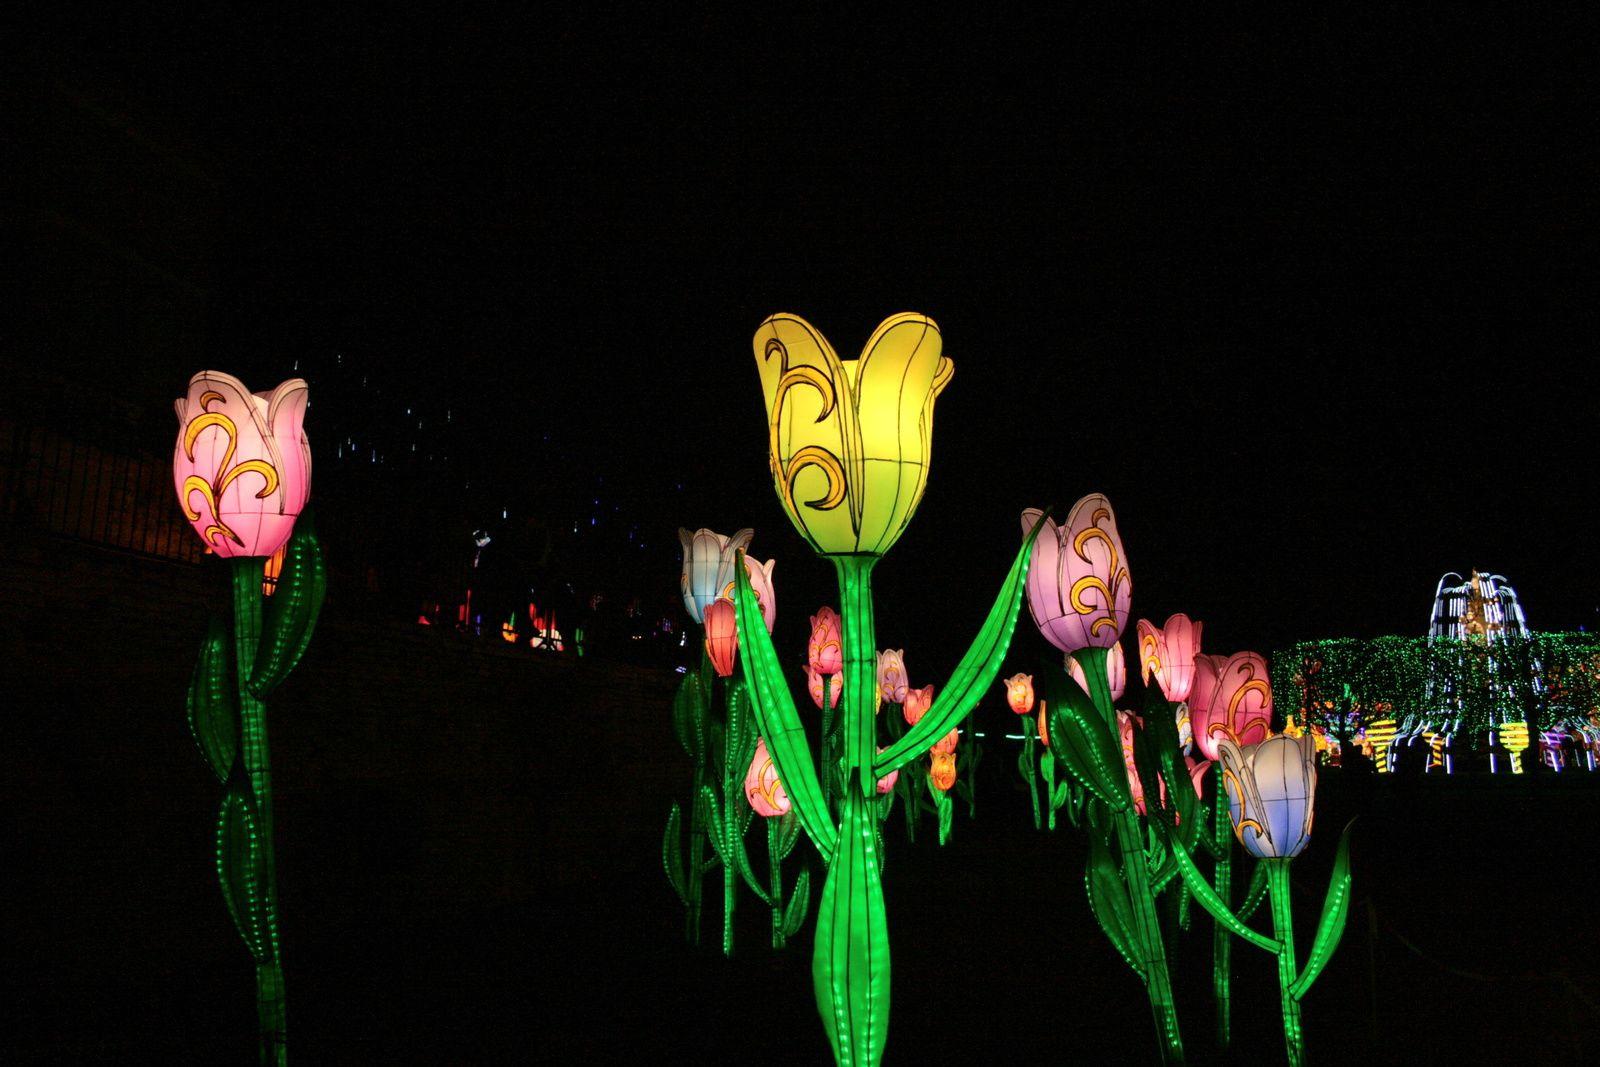 #lanterne #chinois #exposition #charlotteblabla photographie